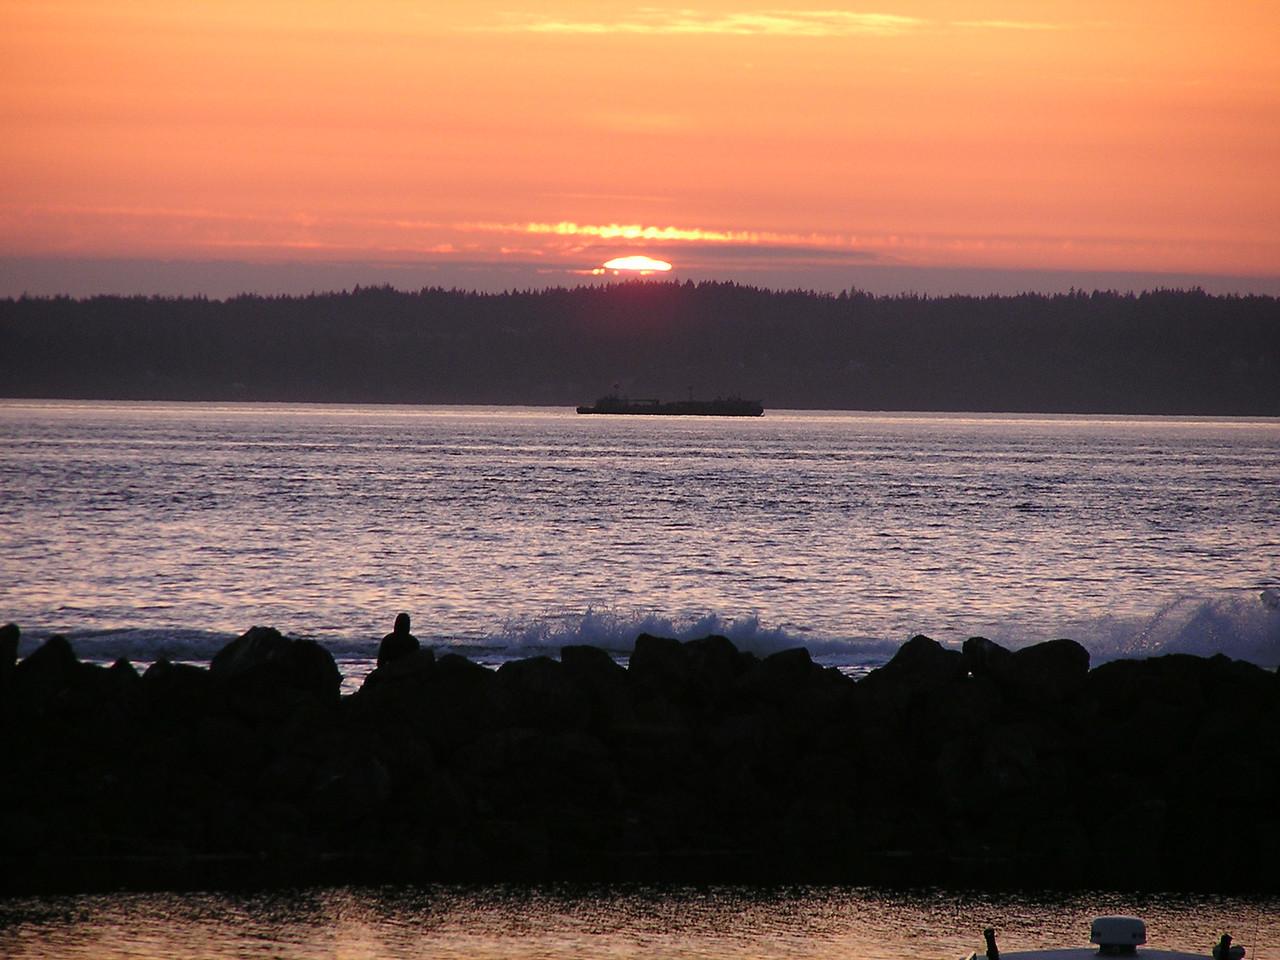 07 06 20 Sunset 013